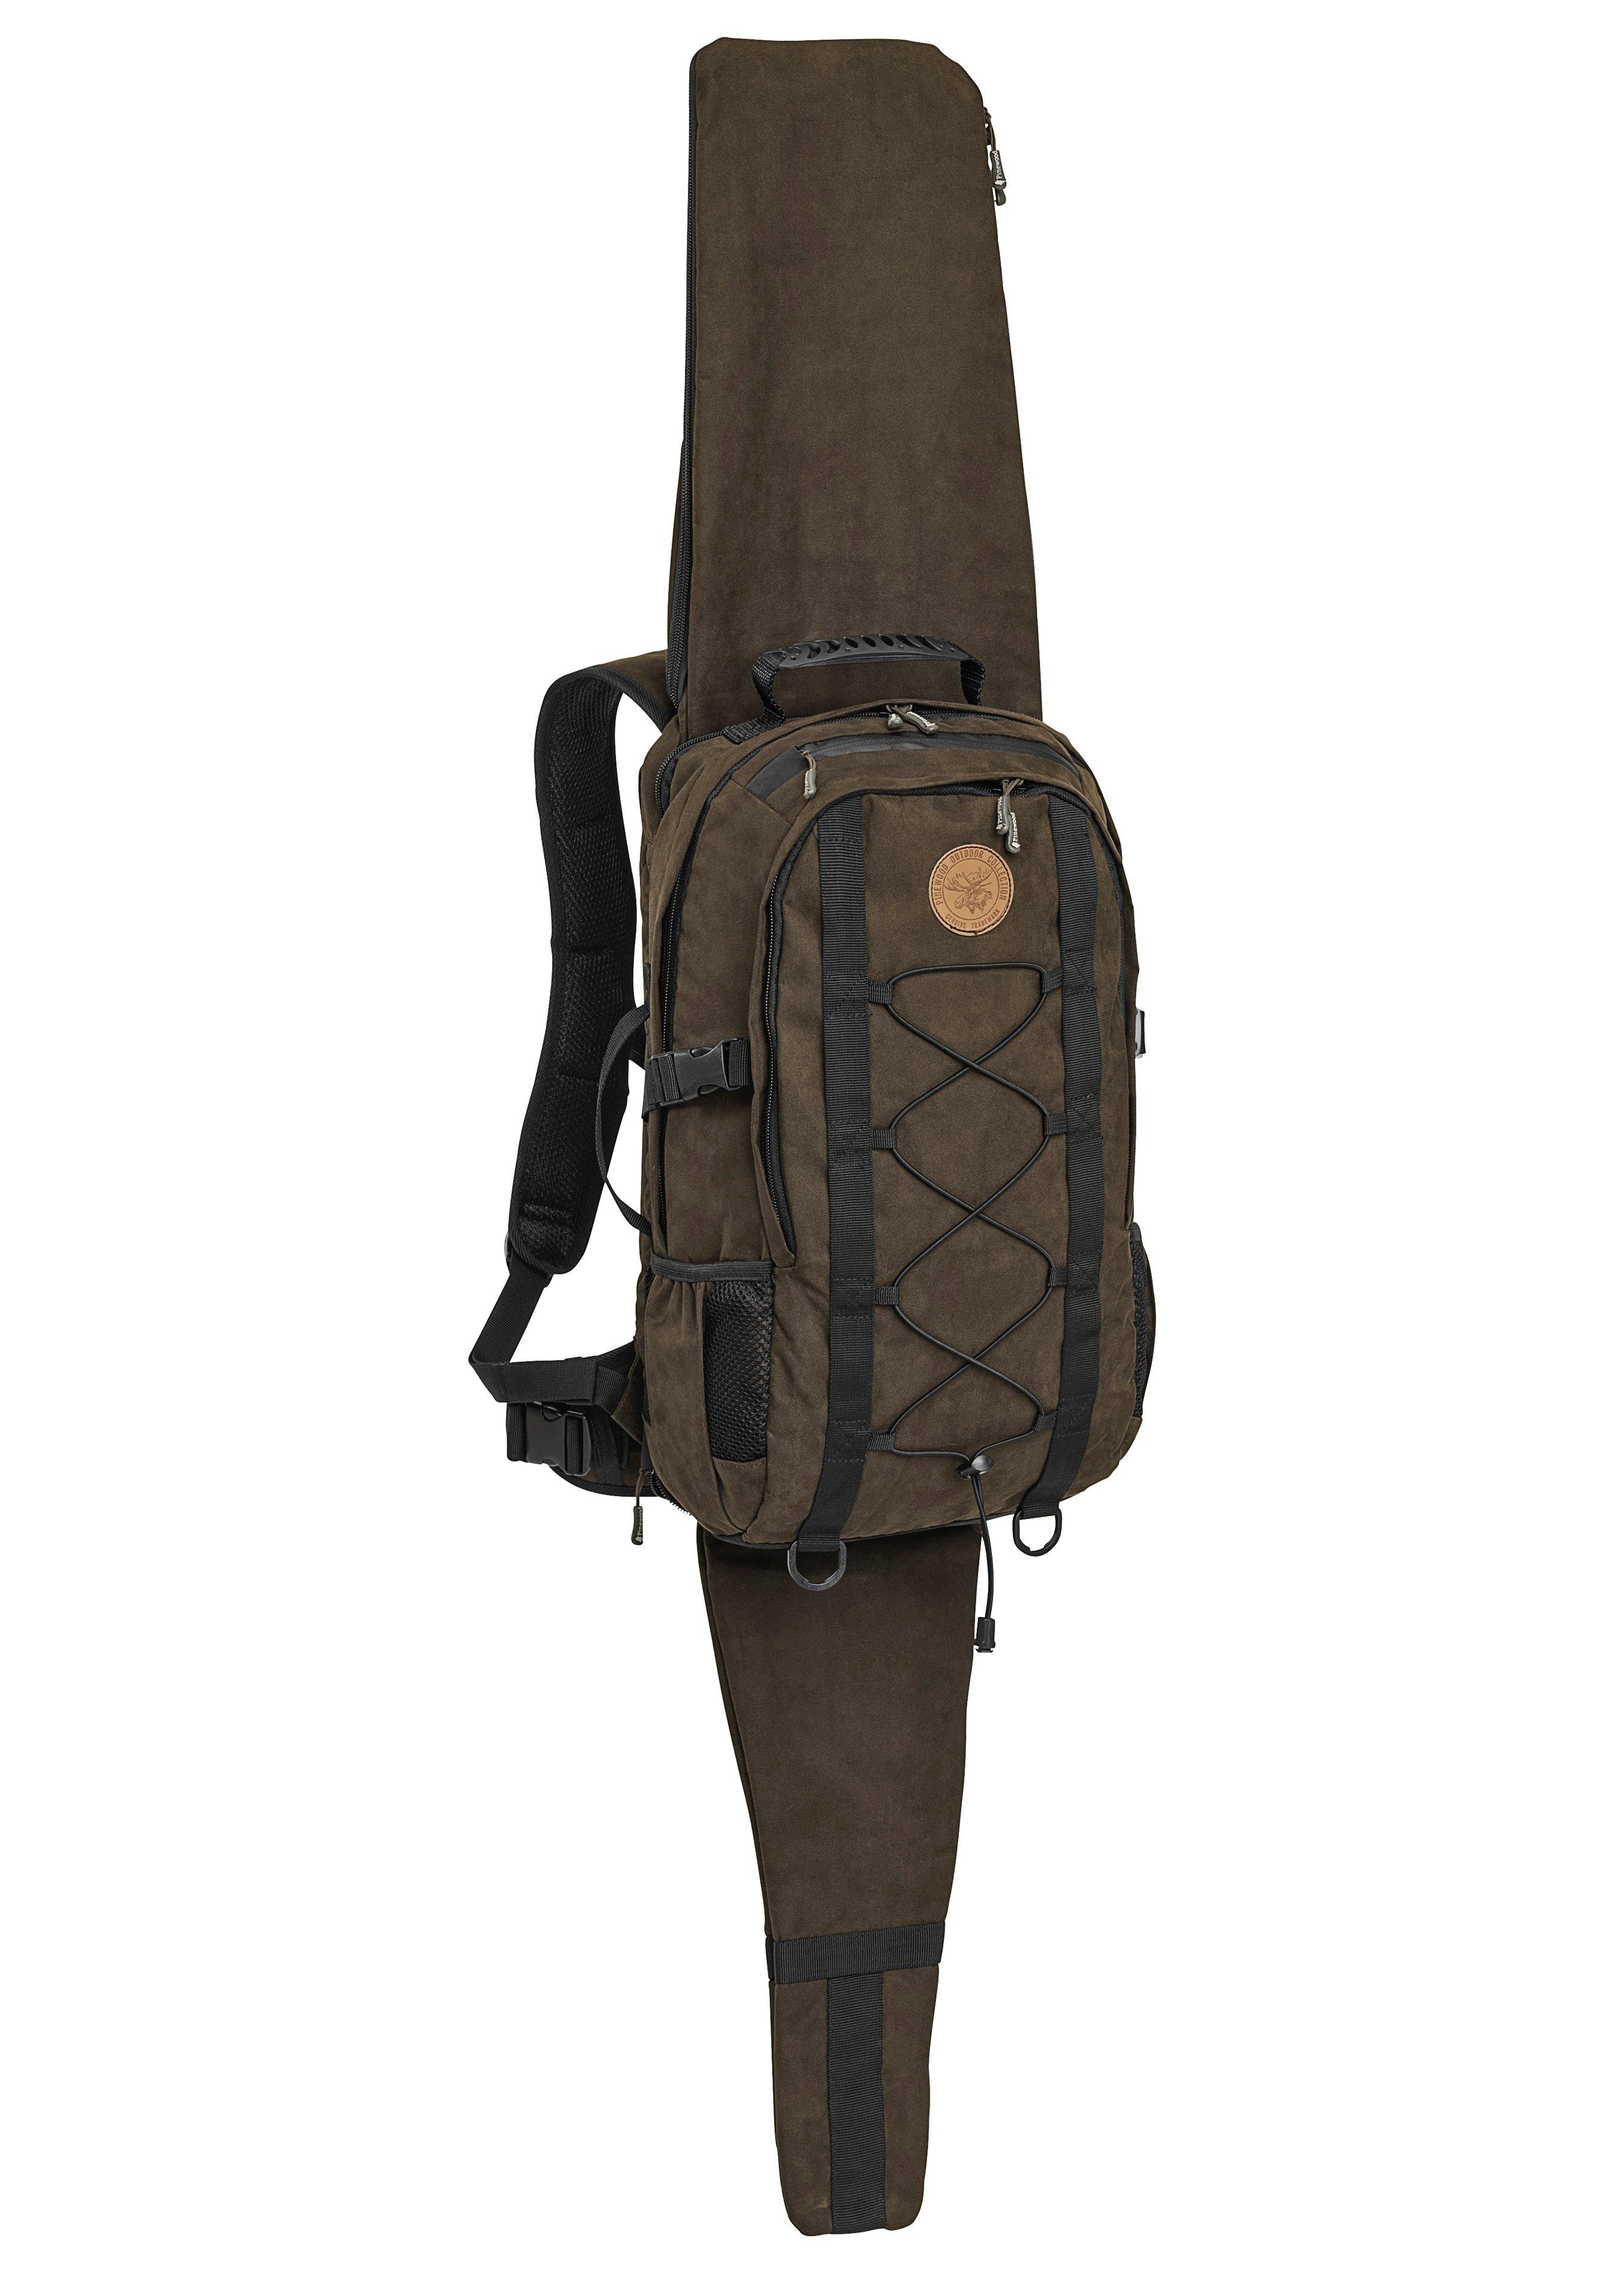 Pinewood Jagd-Rucksack mit Gewehrfutteral 209540 1